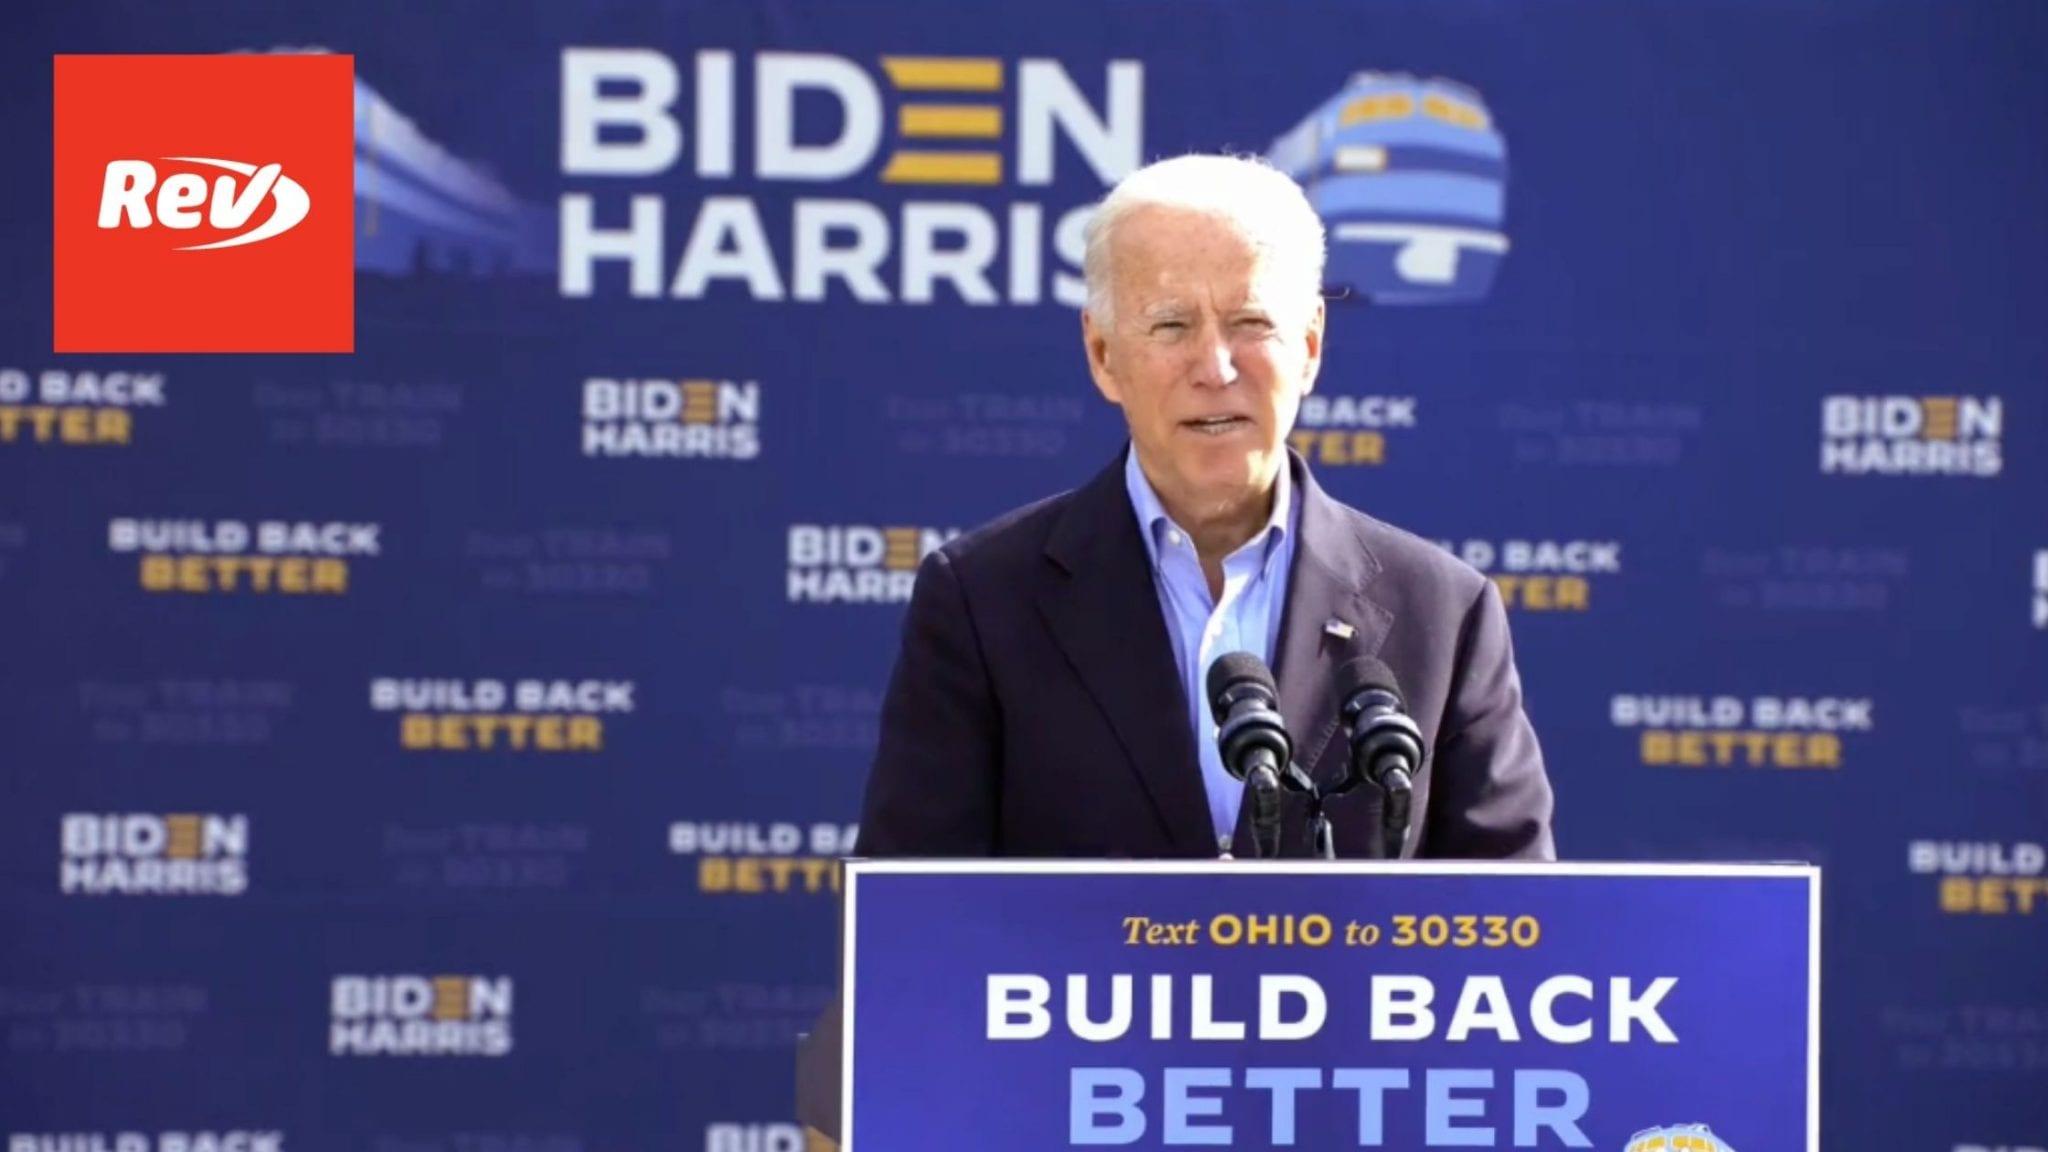 Joe Biden Train Tour Speech Transcript Cleveland, Ohio September 30